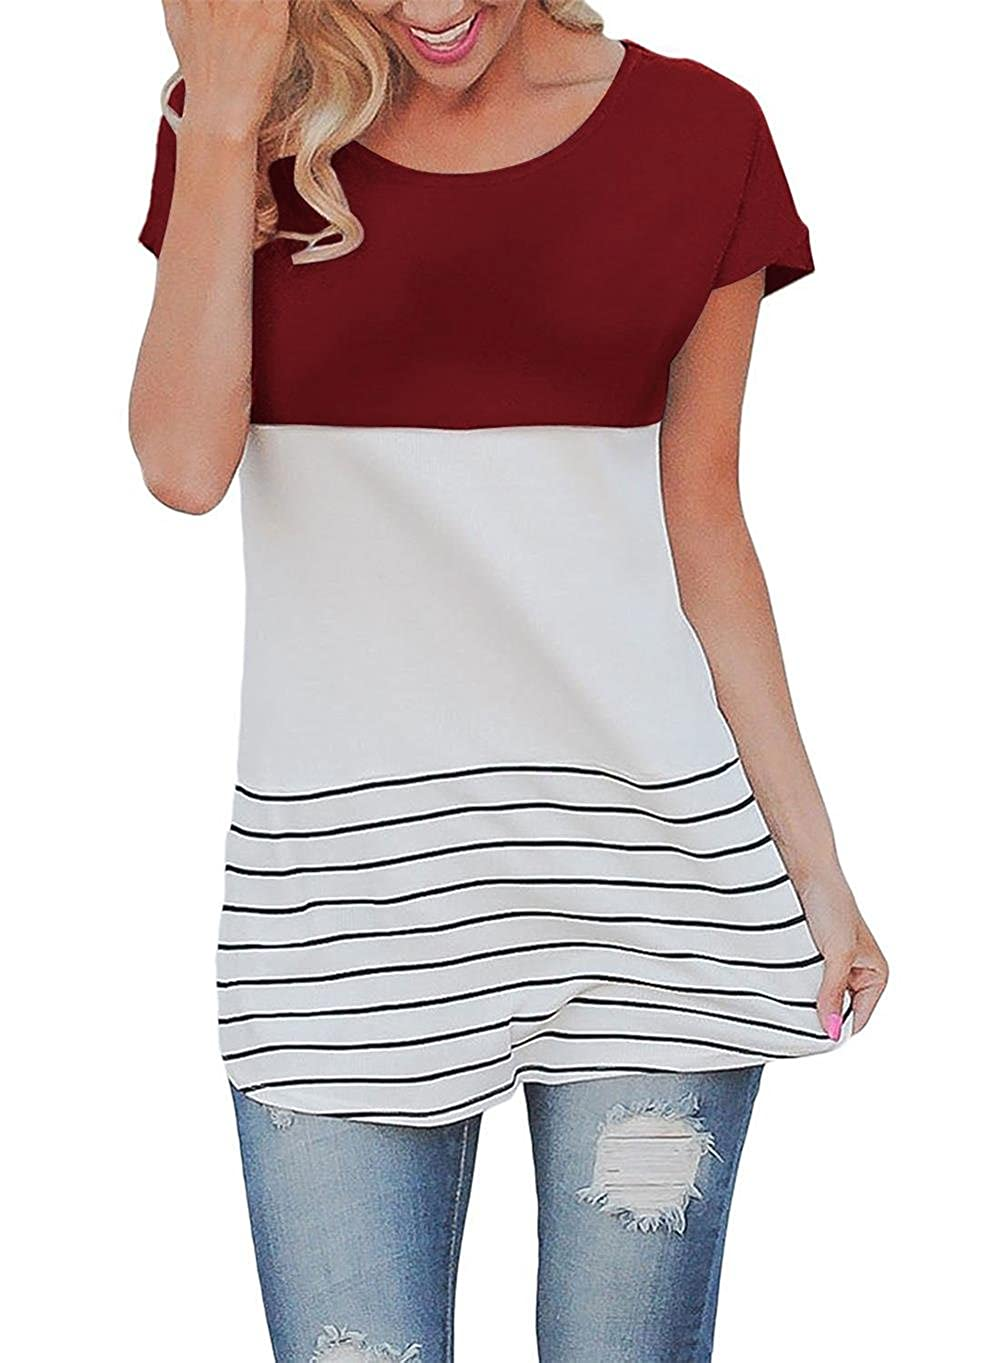 HAOMEILI Women/'s Back Lace Tops Color Block Short Sleeve T-Shirt Tunics Blouse